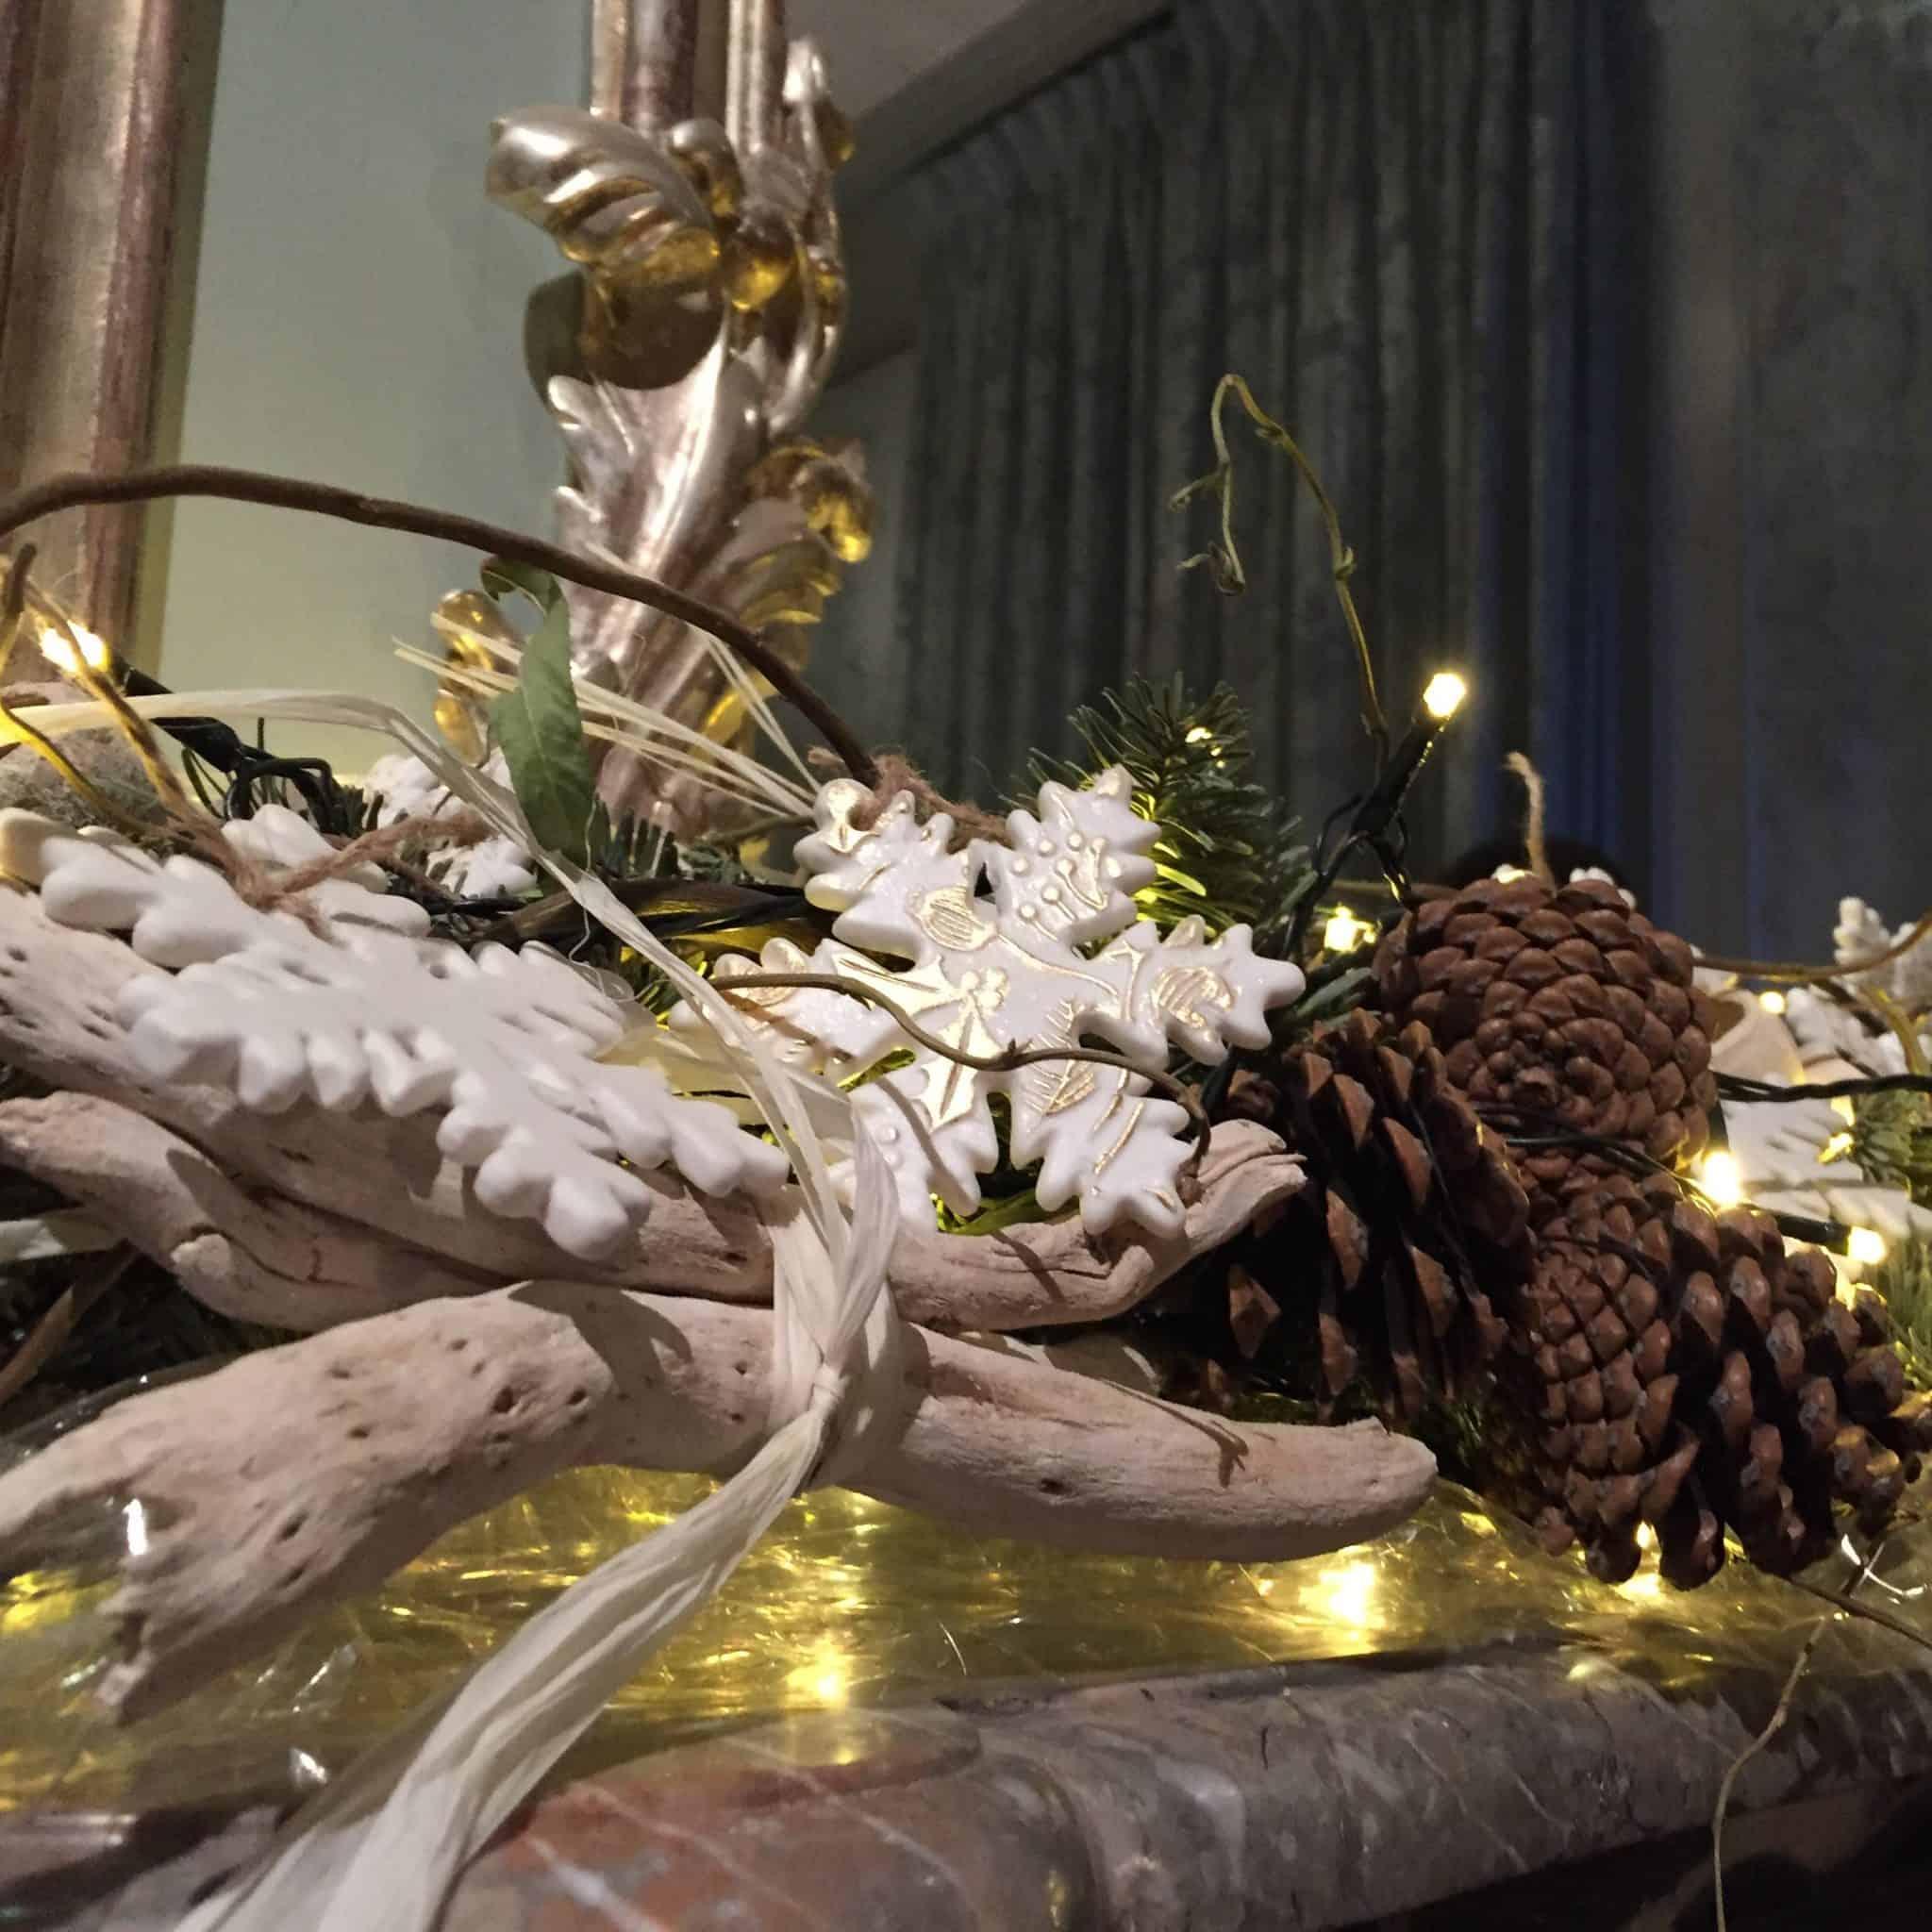 Christmas decorations at Waddesdon Manor